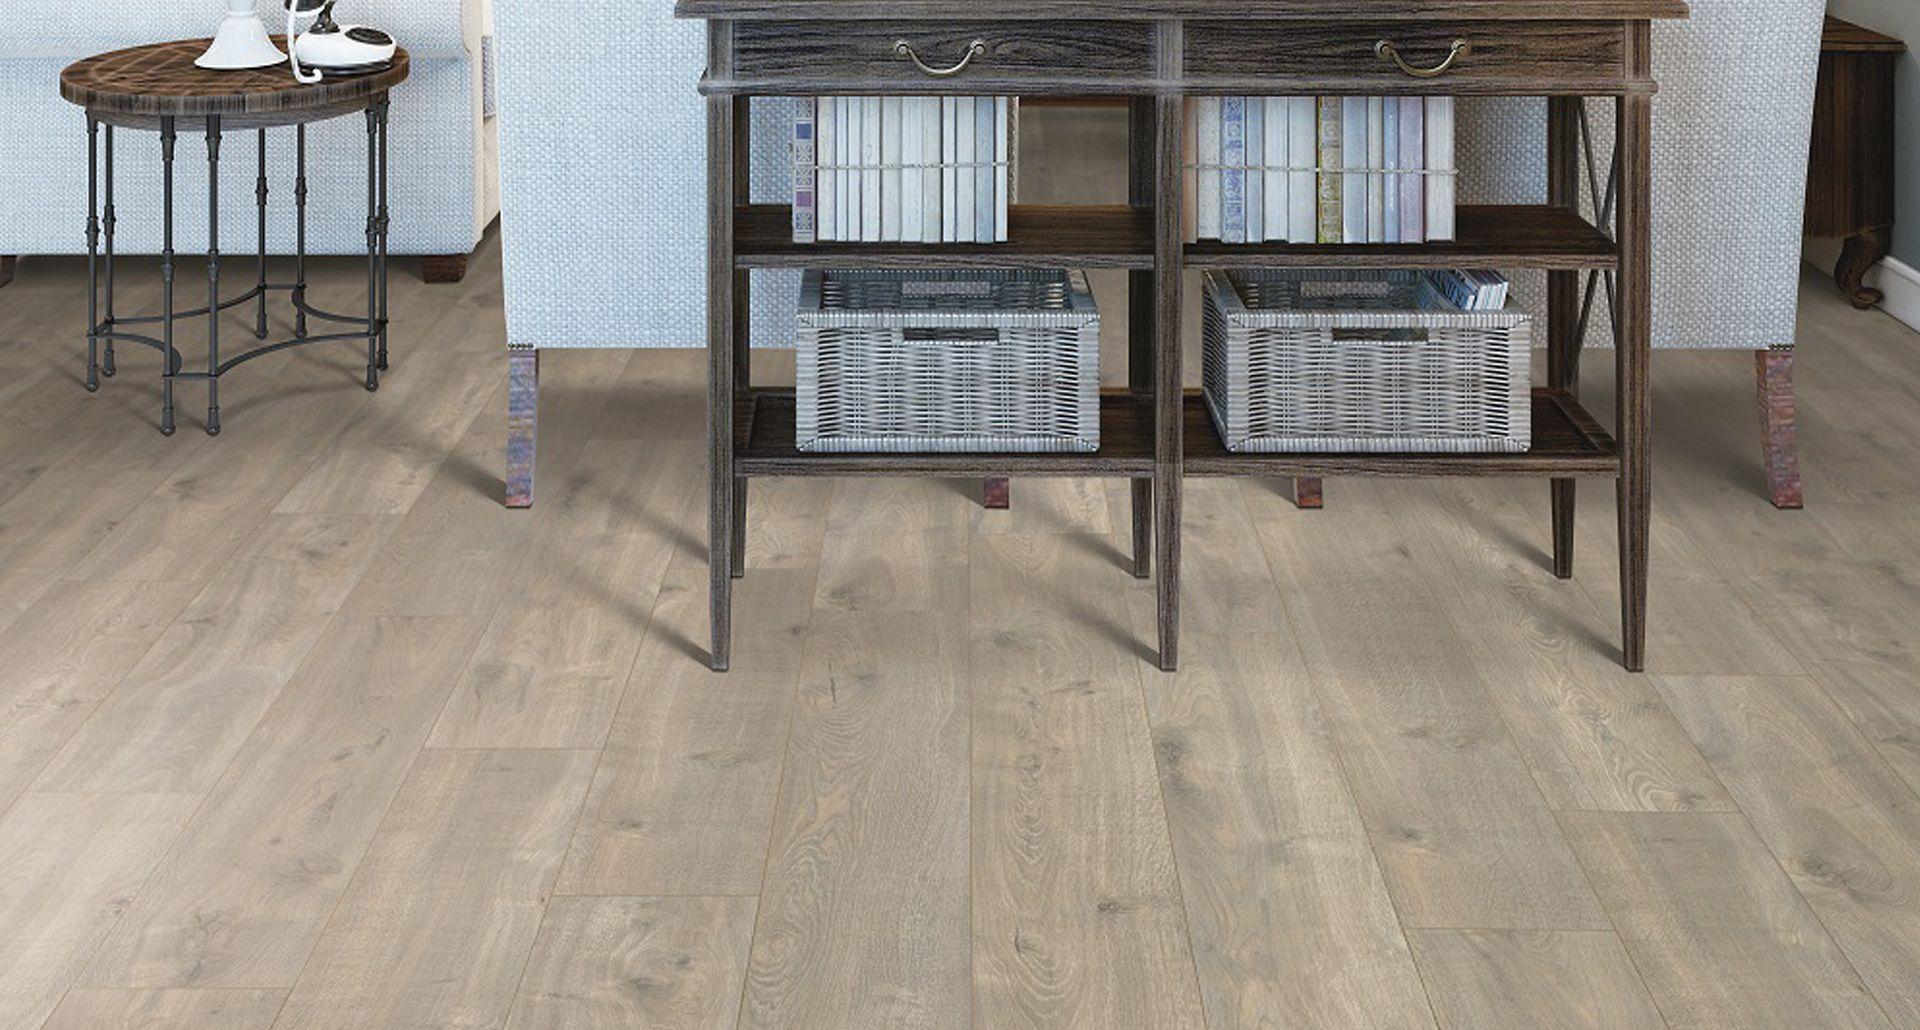 Urban Putty Oak Pergo Xp Laminate Flooring Pergo Flooring Beach House Flooring House Flooring Pergo Flooring